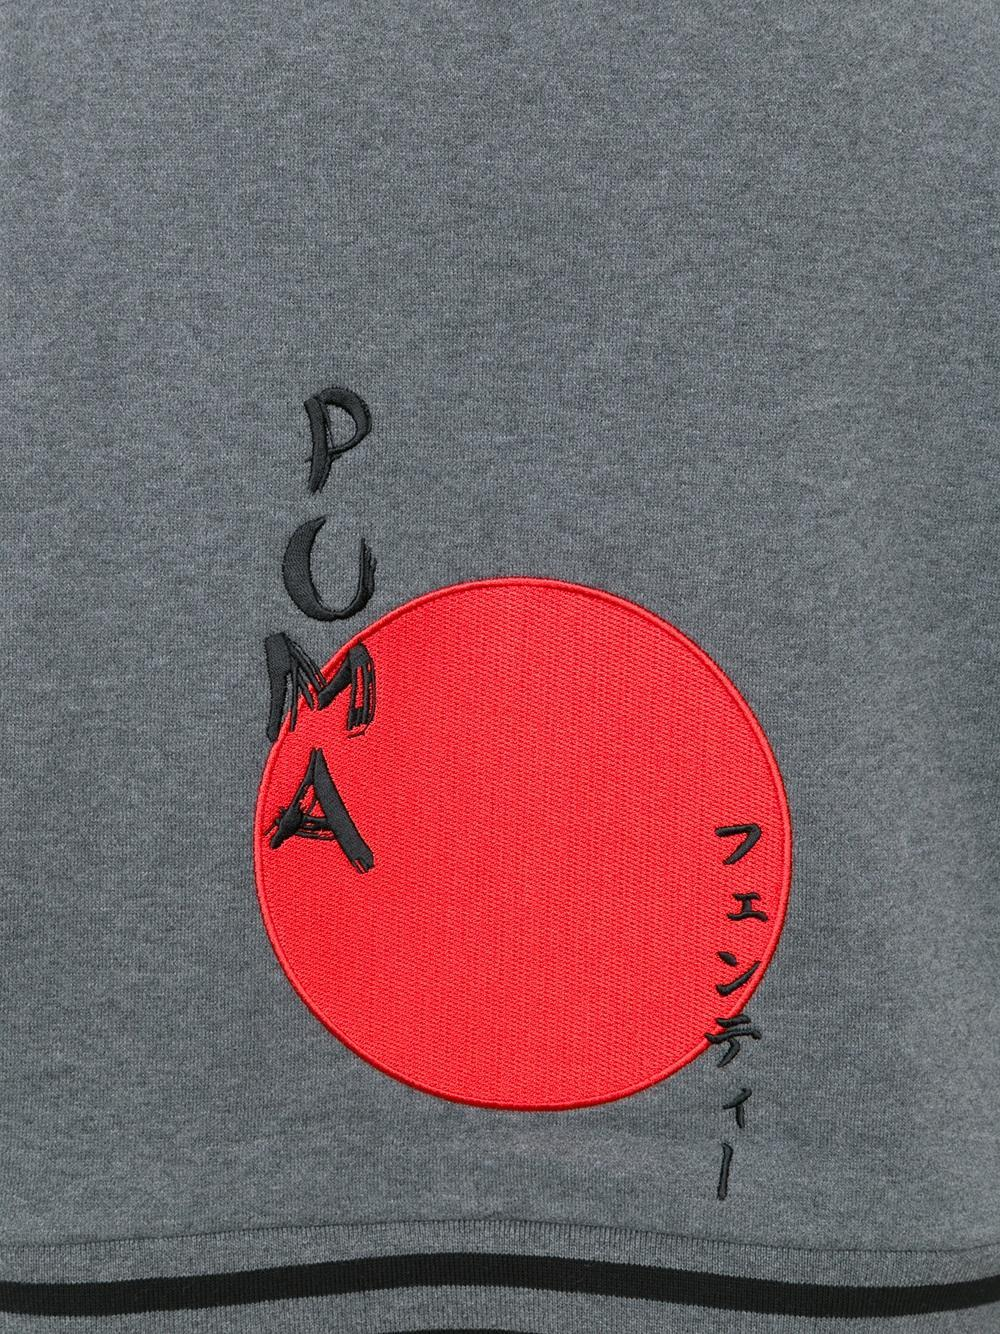 b7b874926fd PUMA Fenty X Rihanna  rising Sun  Lace-up Sweatshirt in Gray - Lyst